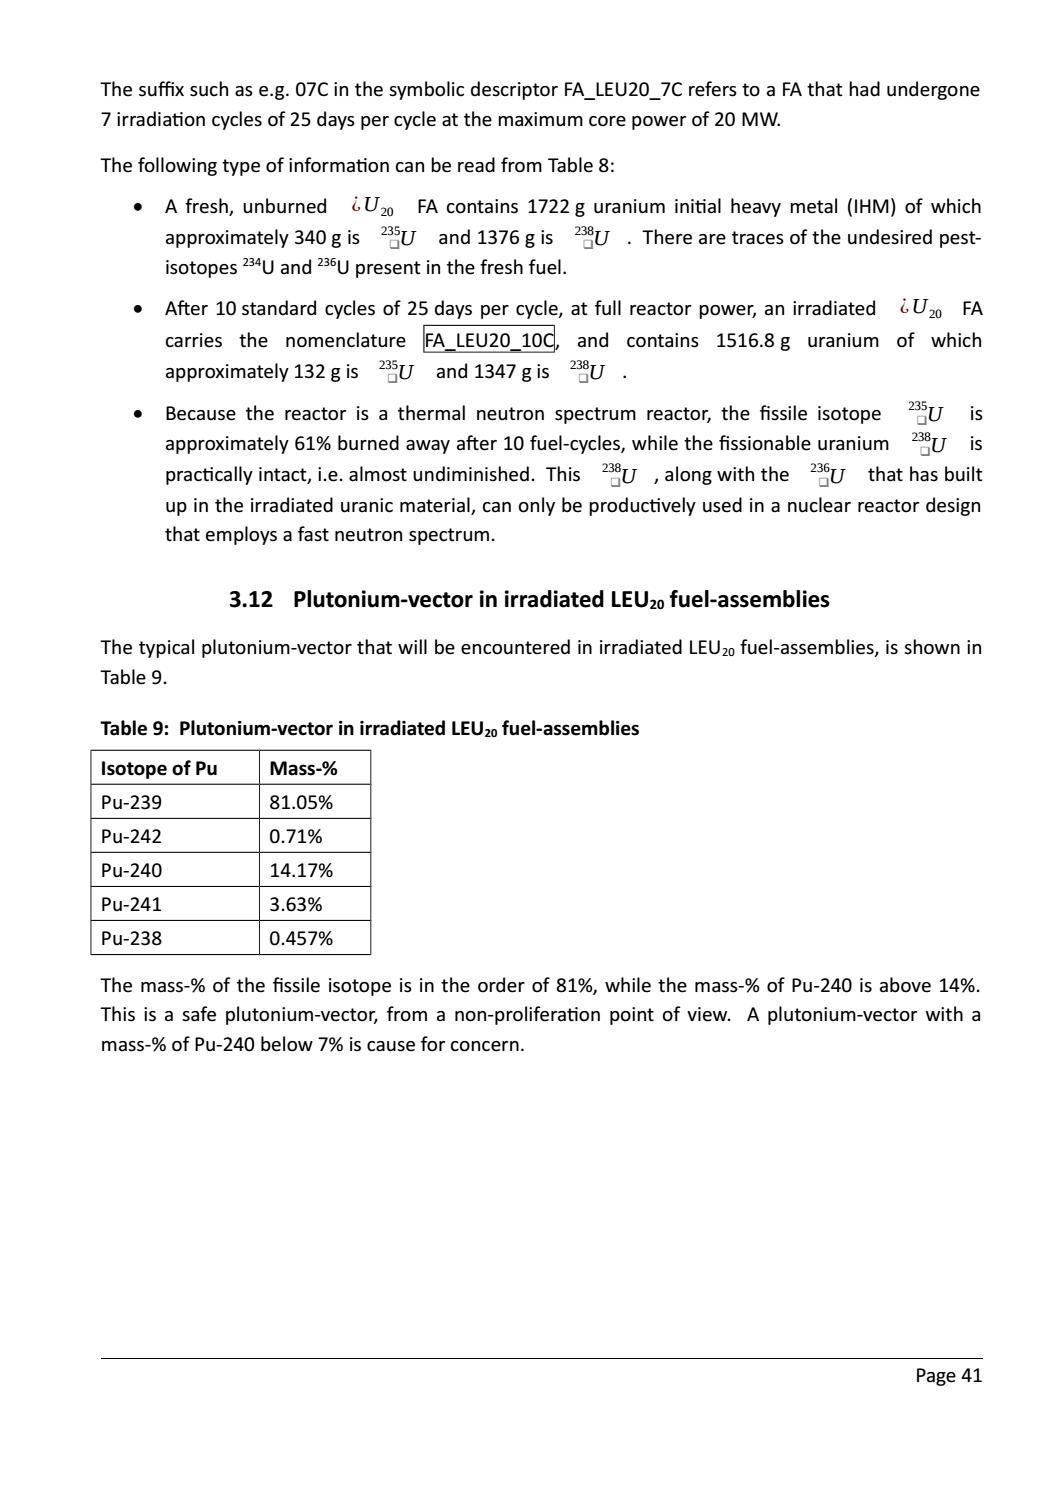 RADIOACTIVE WASTE: COMPUTATIONAL CHARACTERISATION and SHIELDING page 66